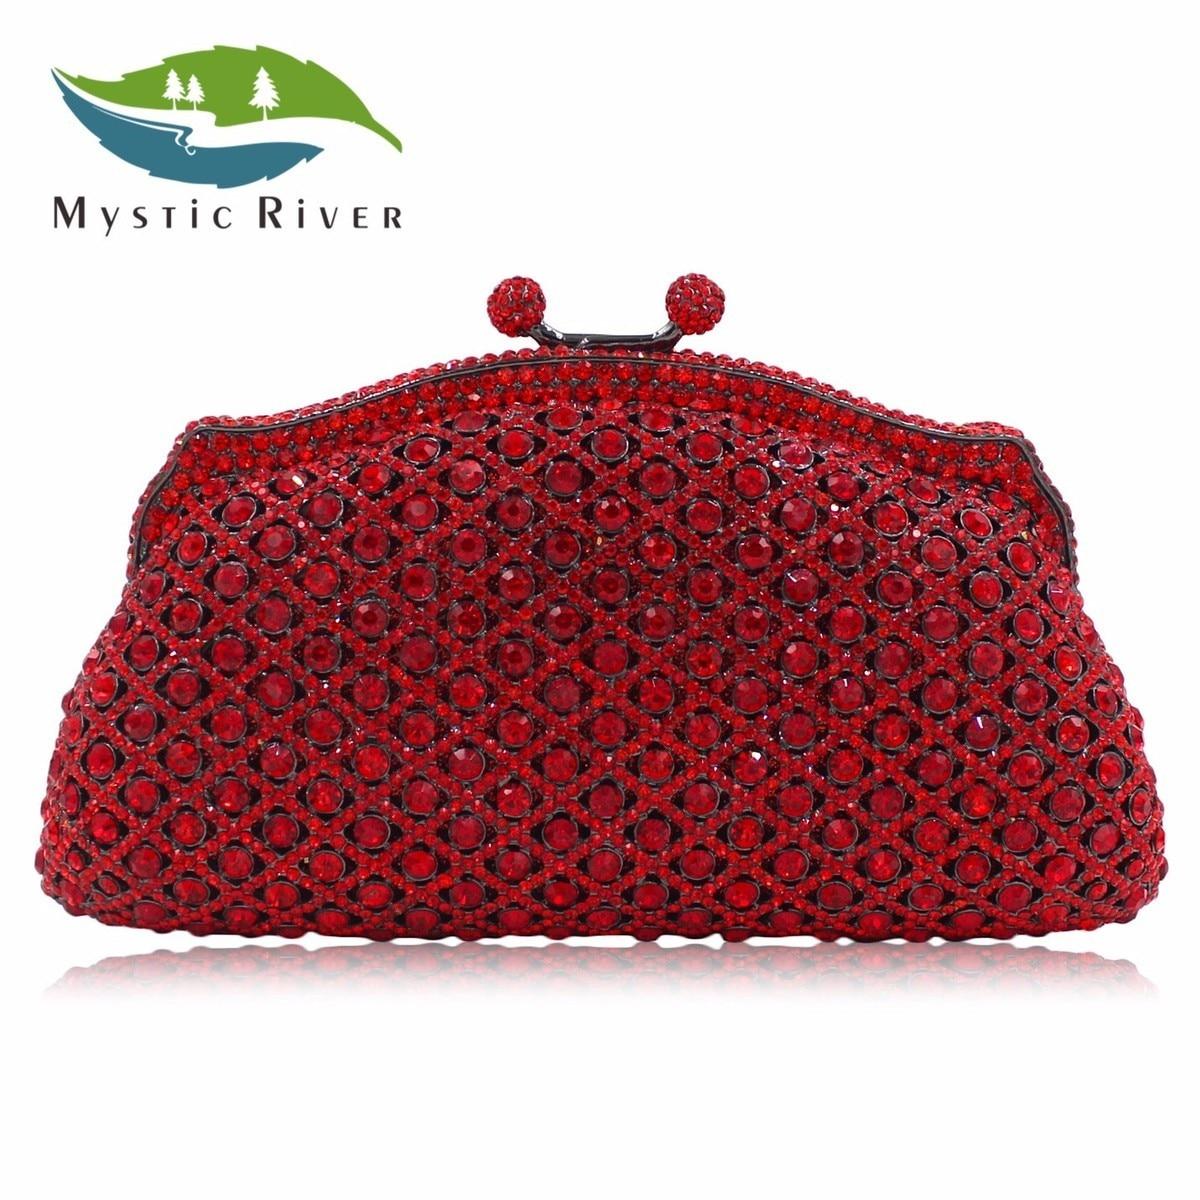 Mystic River New Women Luxury Diamond Evening bags Handbag Crystal Clutches Party Wedding Purse Red Chain as16 9 rose top fashion luxury diamond african handbag purse for party wedding